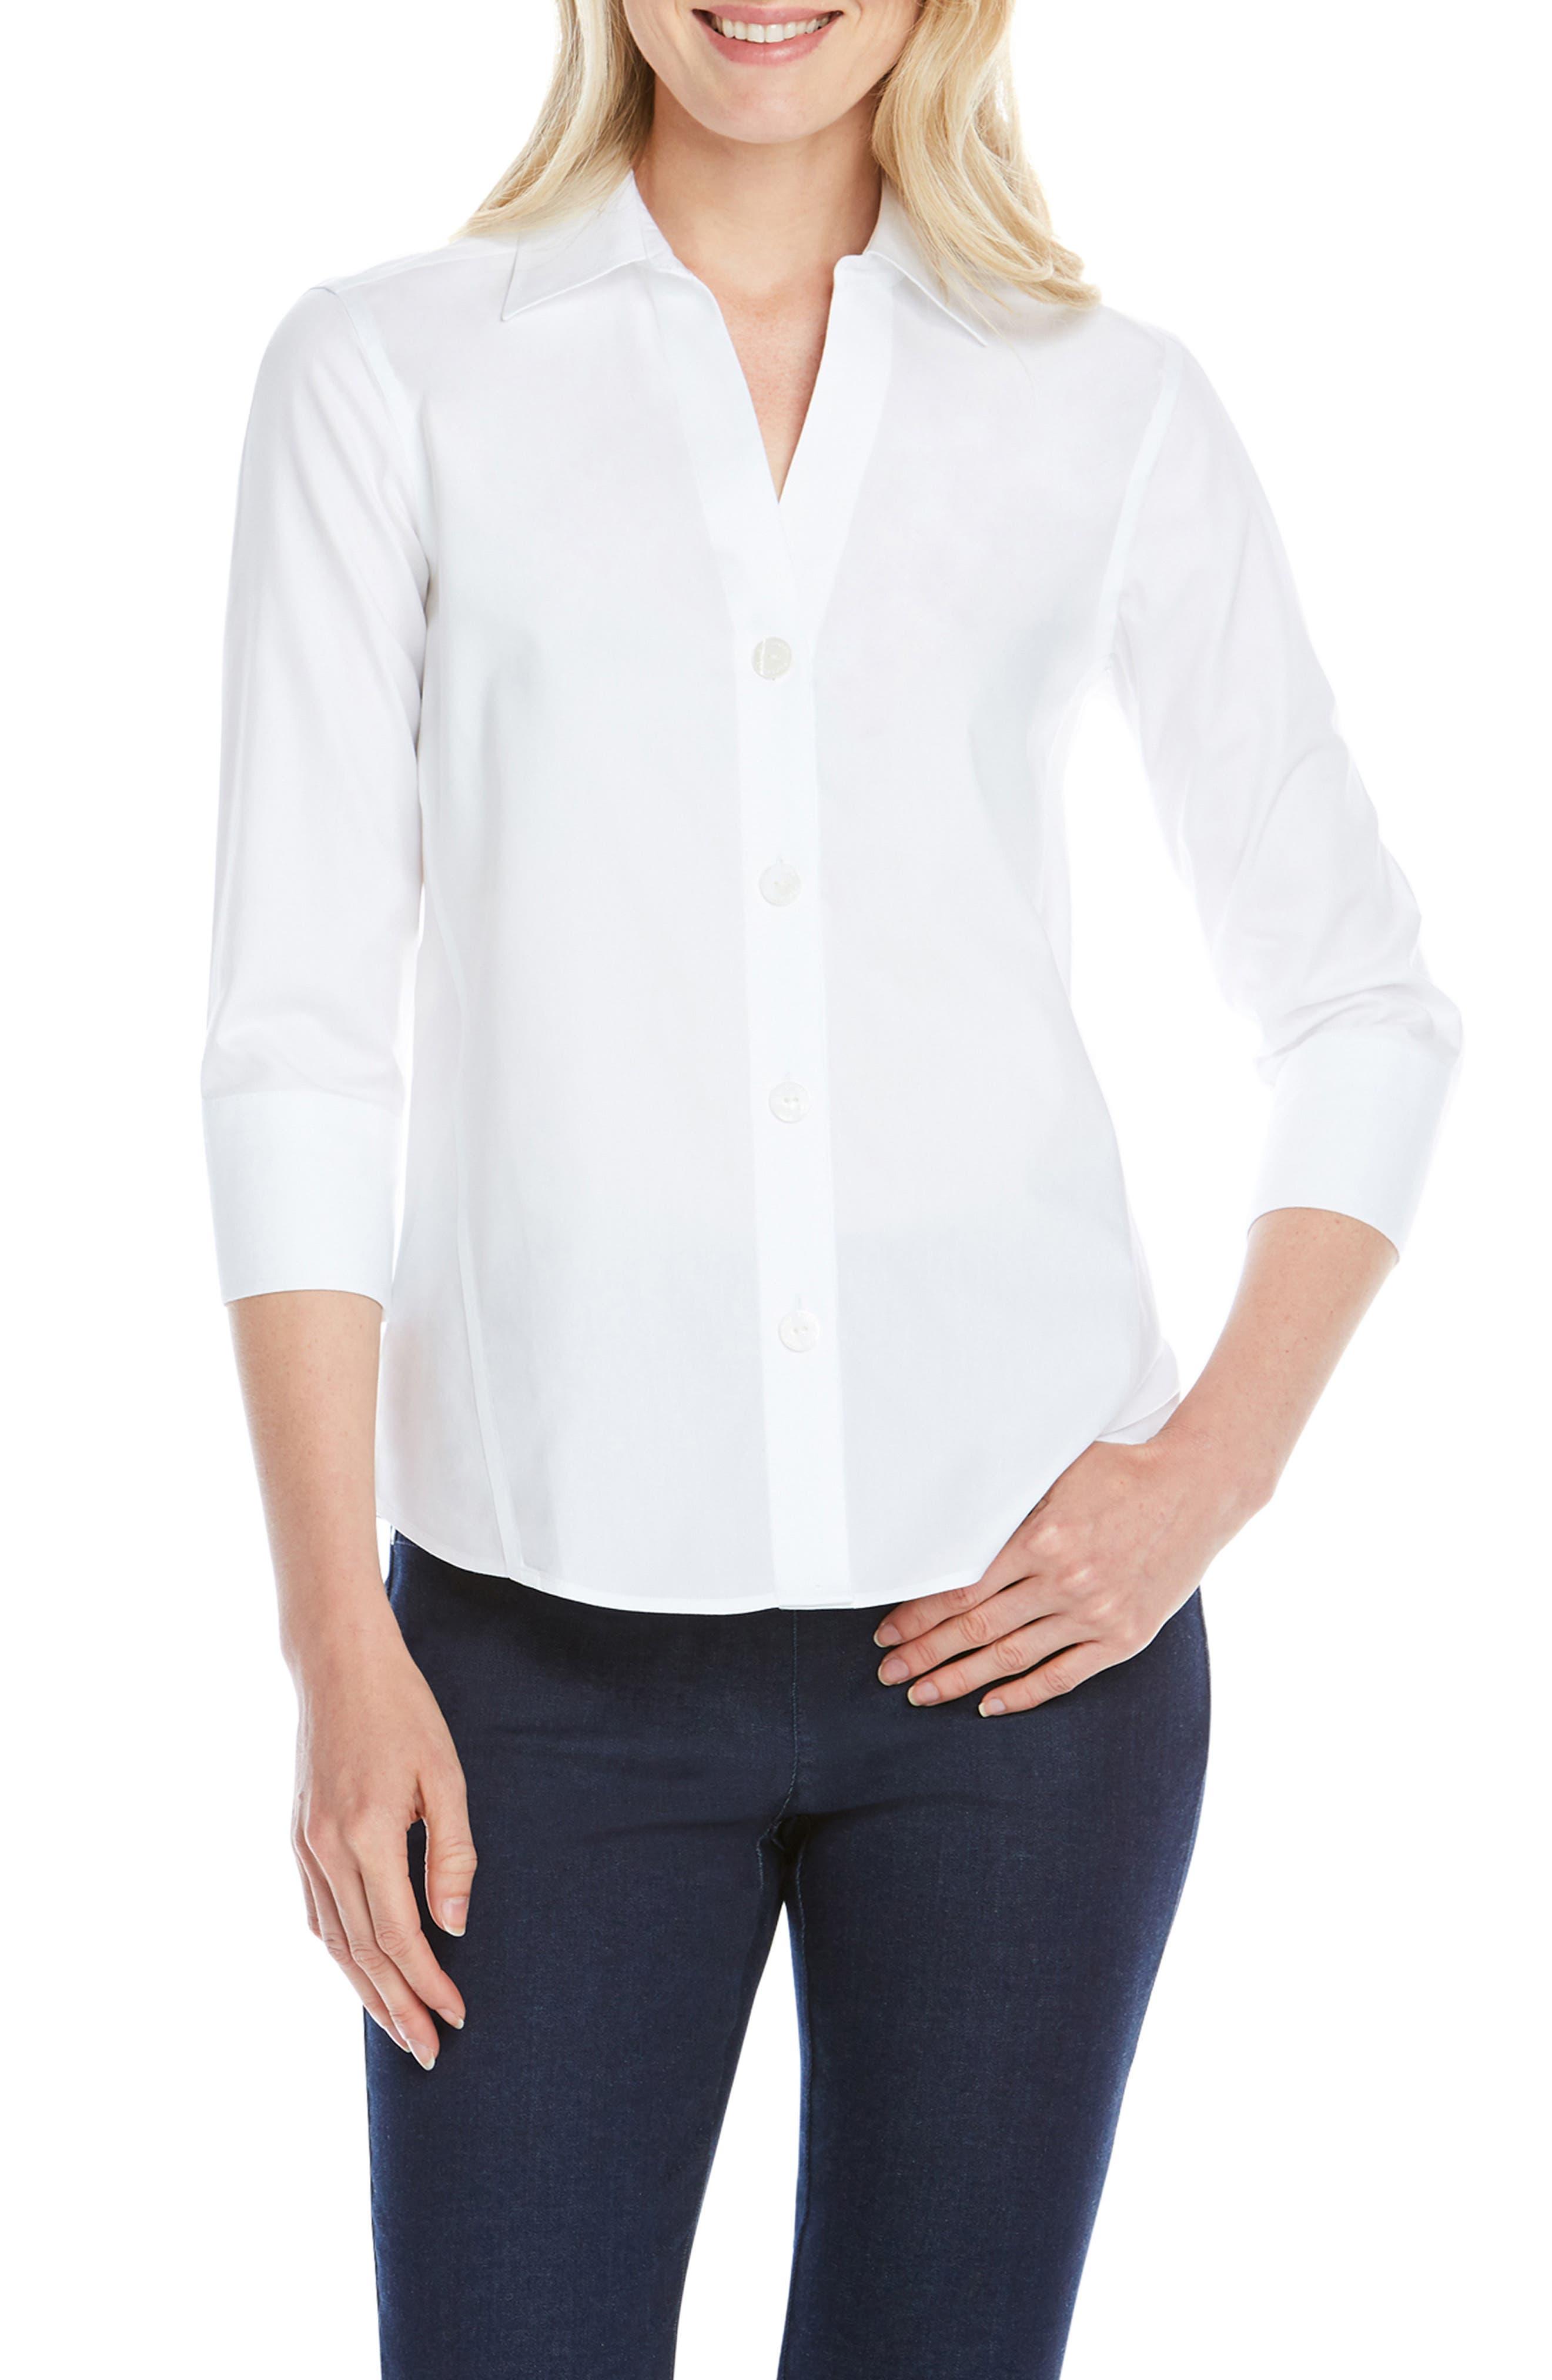 Paityn Non-Iron Cotton Shirt, Main, color, WHITE